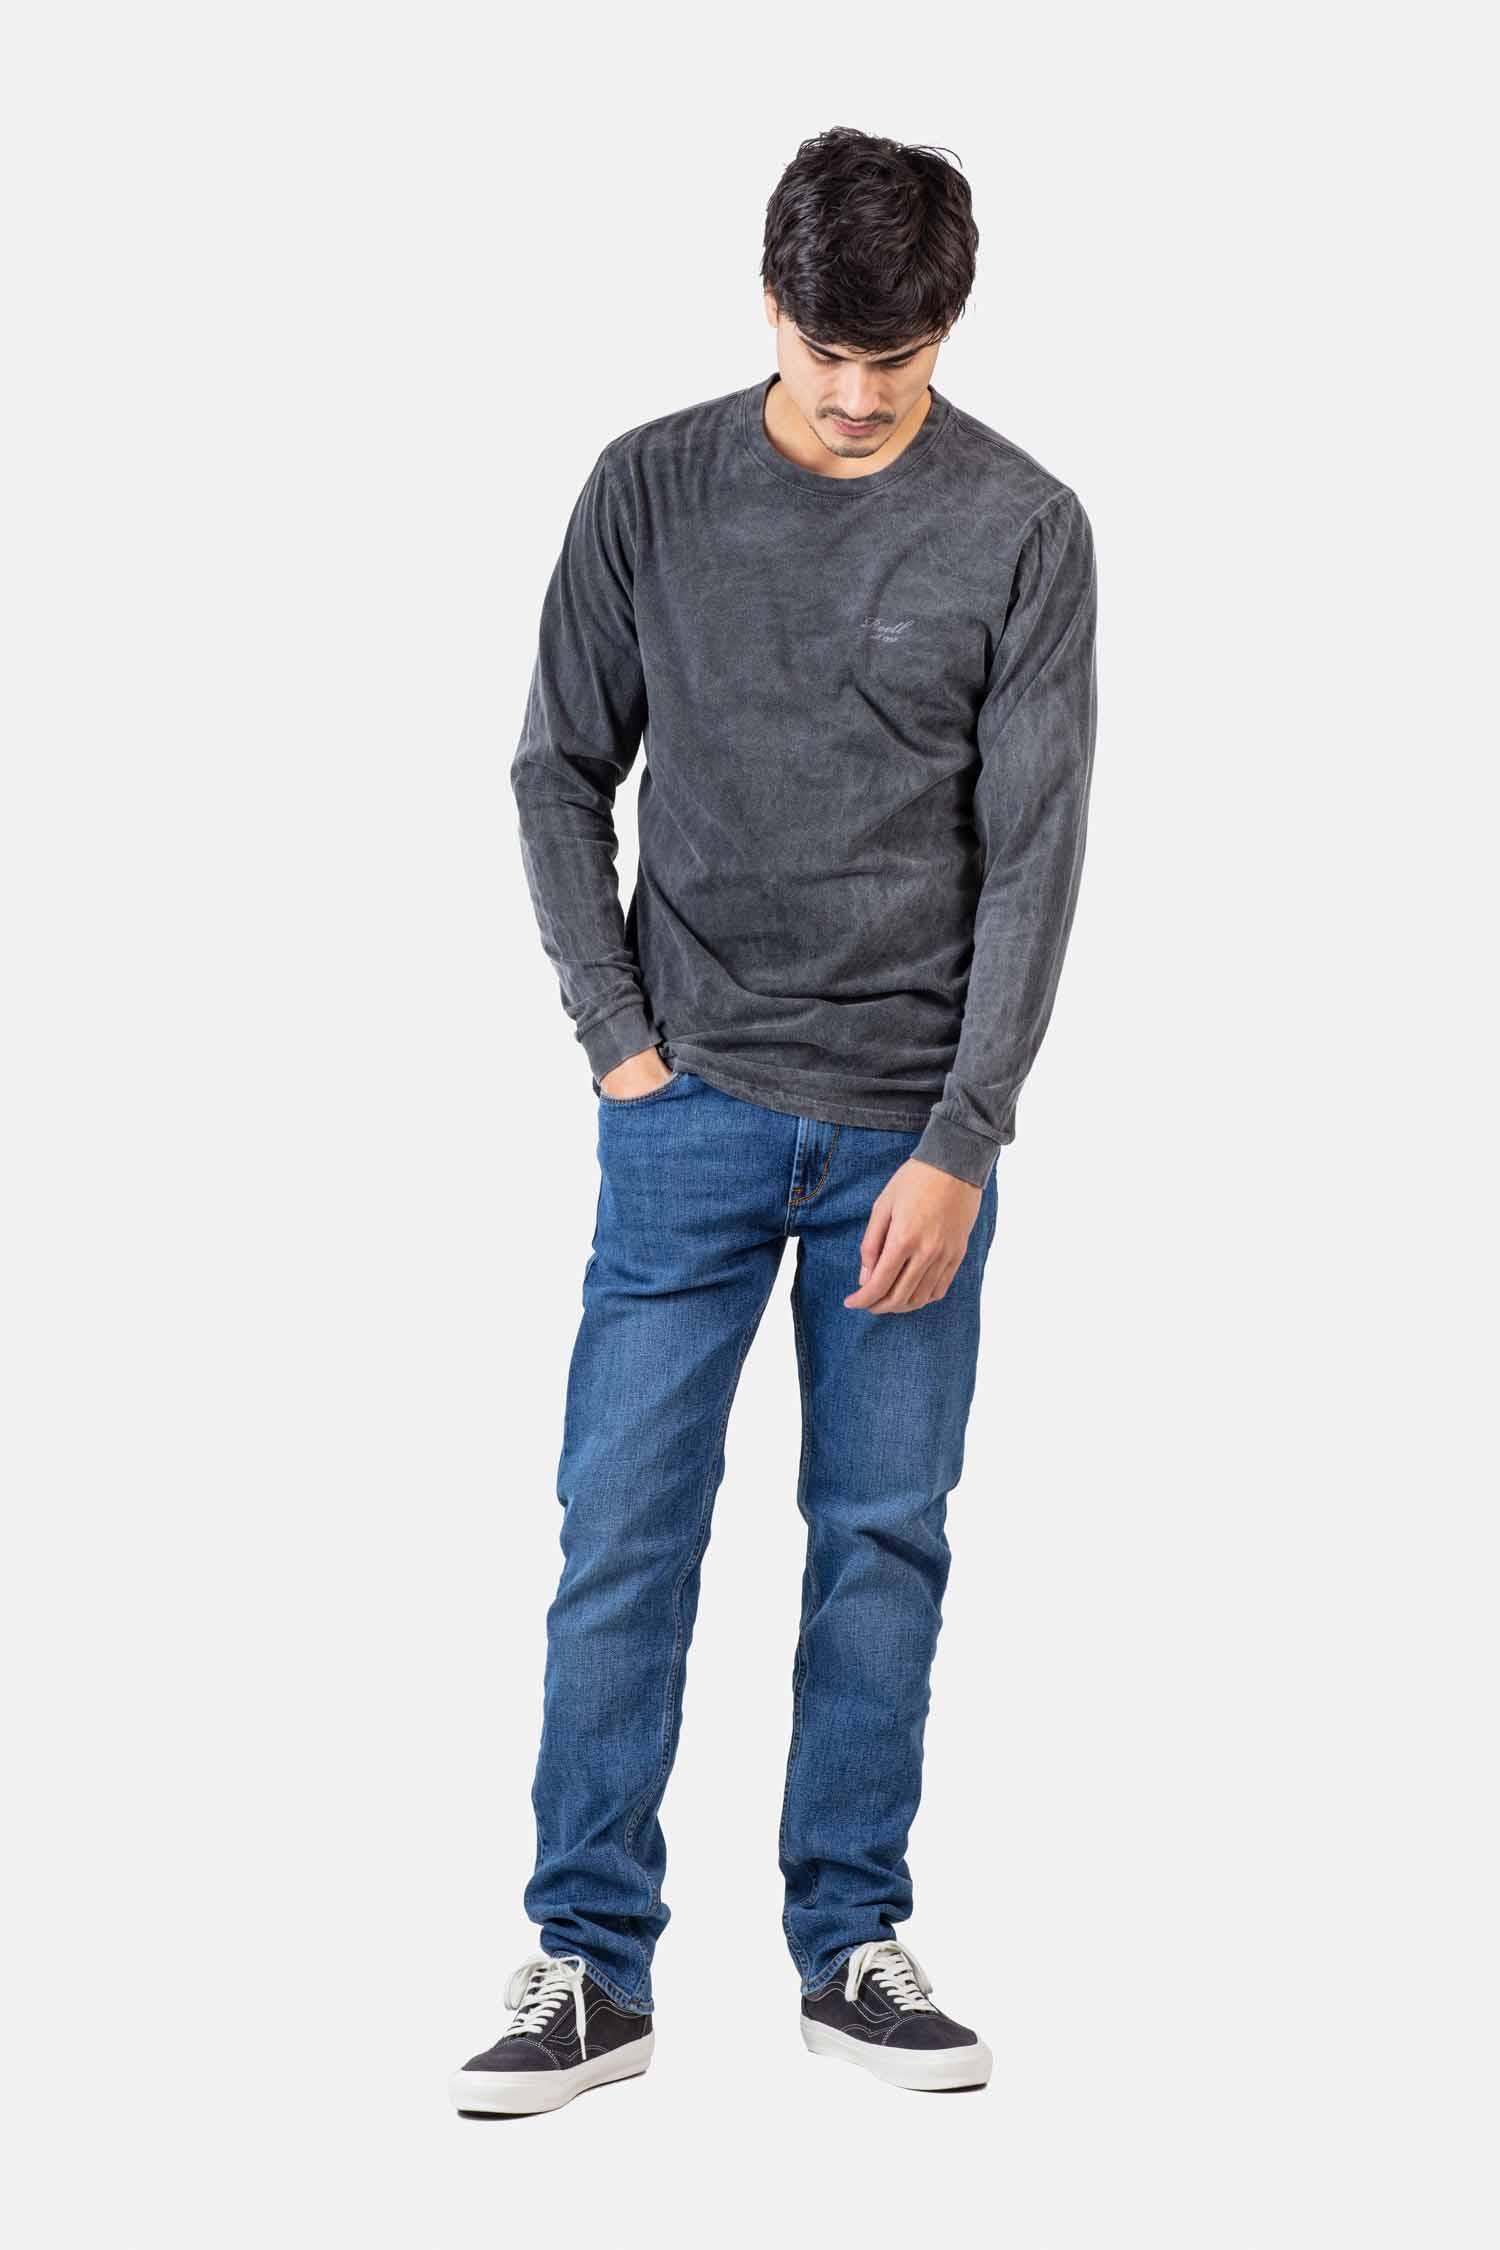 REELL-NOVA-2-Jeans-aged-mid-blue-6